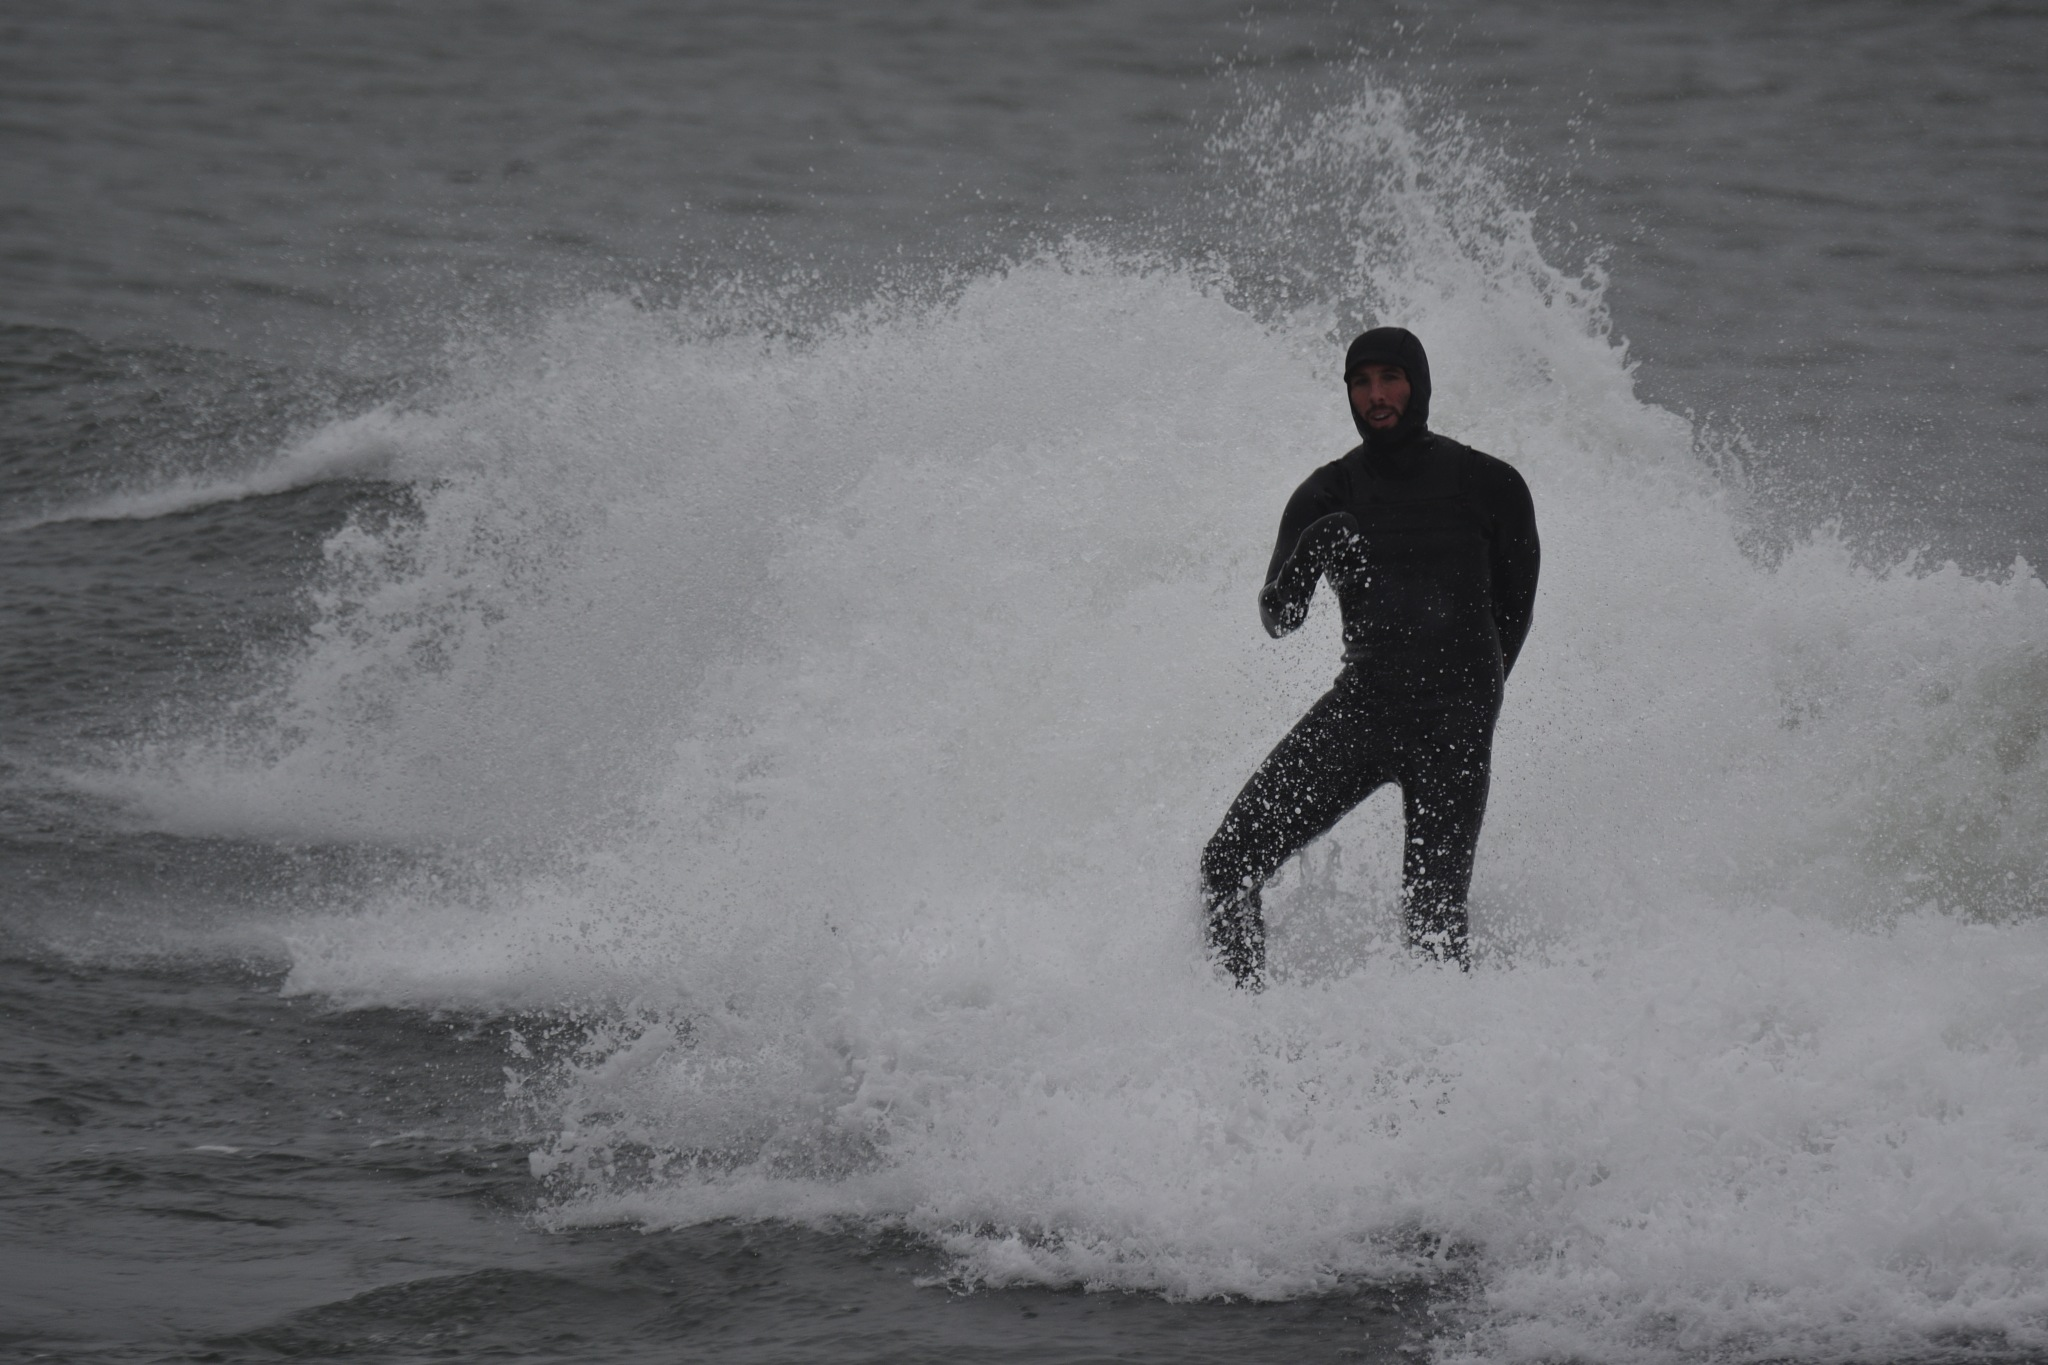 Dec 18 pre Christmas surf Narragansett RI by Shanon